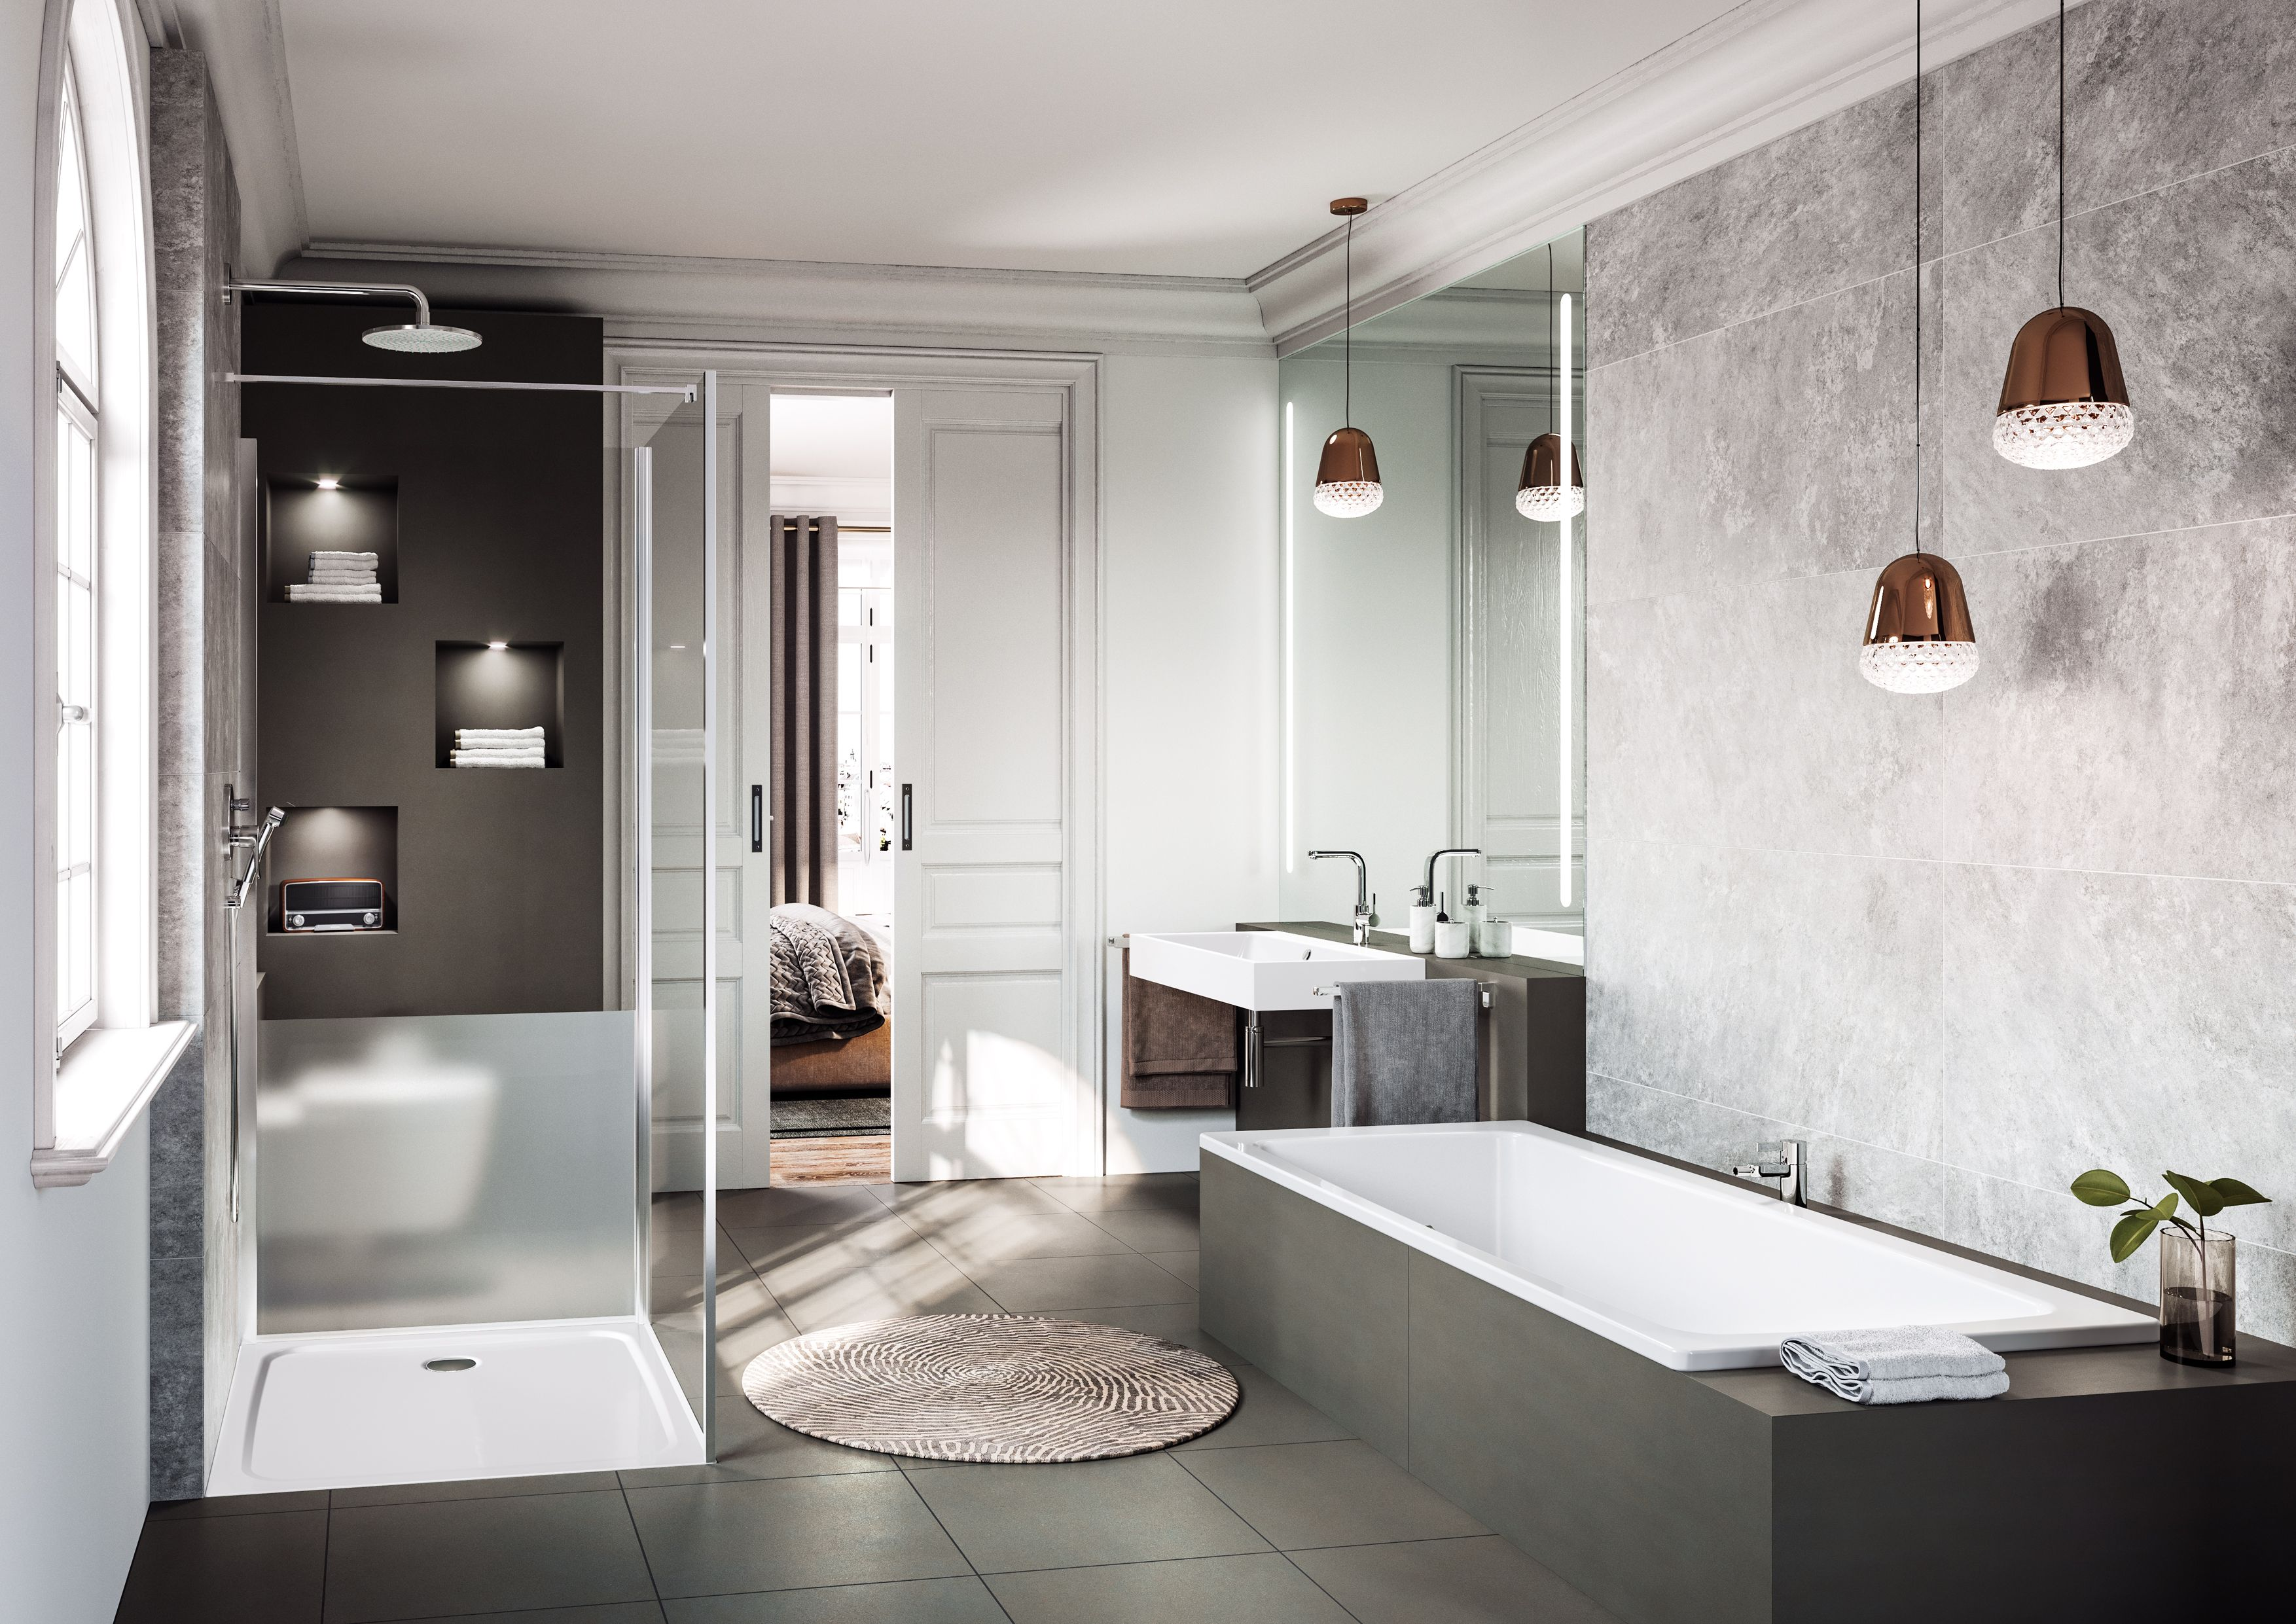 Badezimmer Ideen Altbau In 2020 Home Home Decor Decor